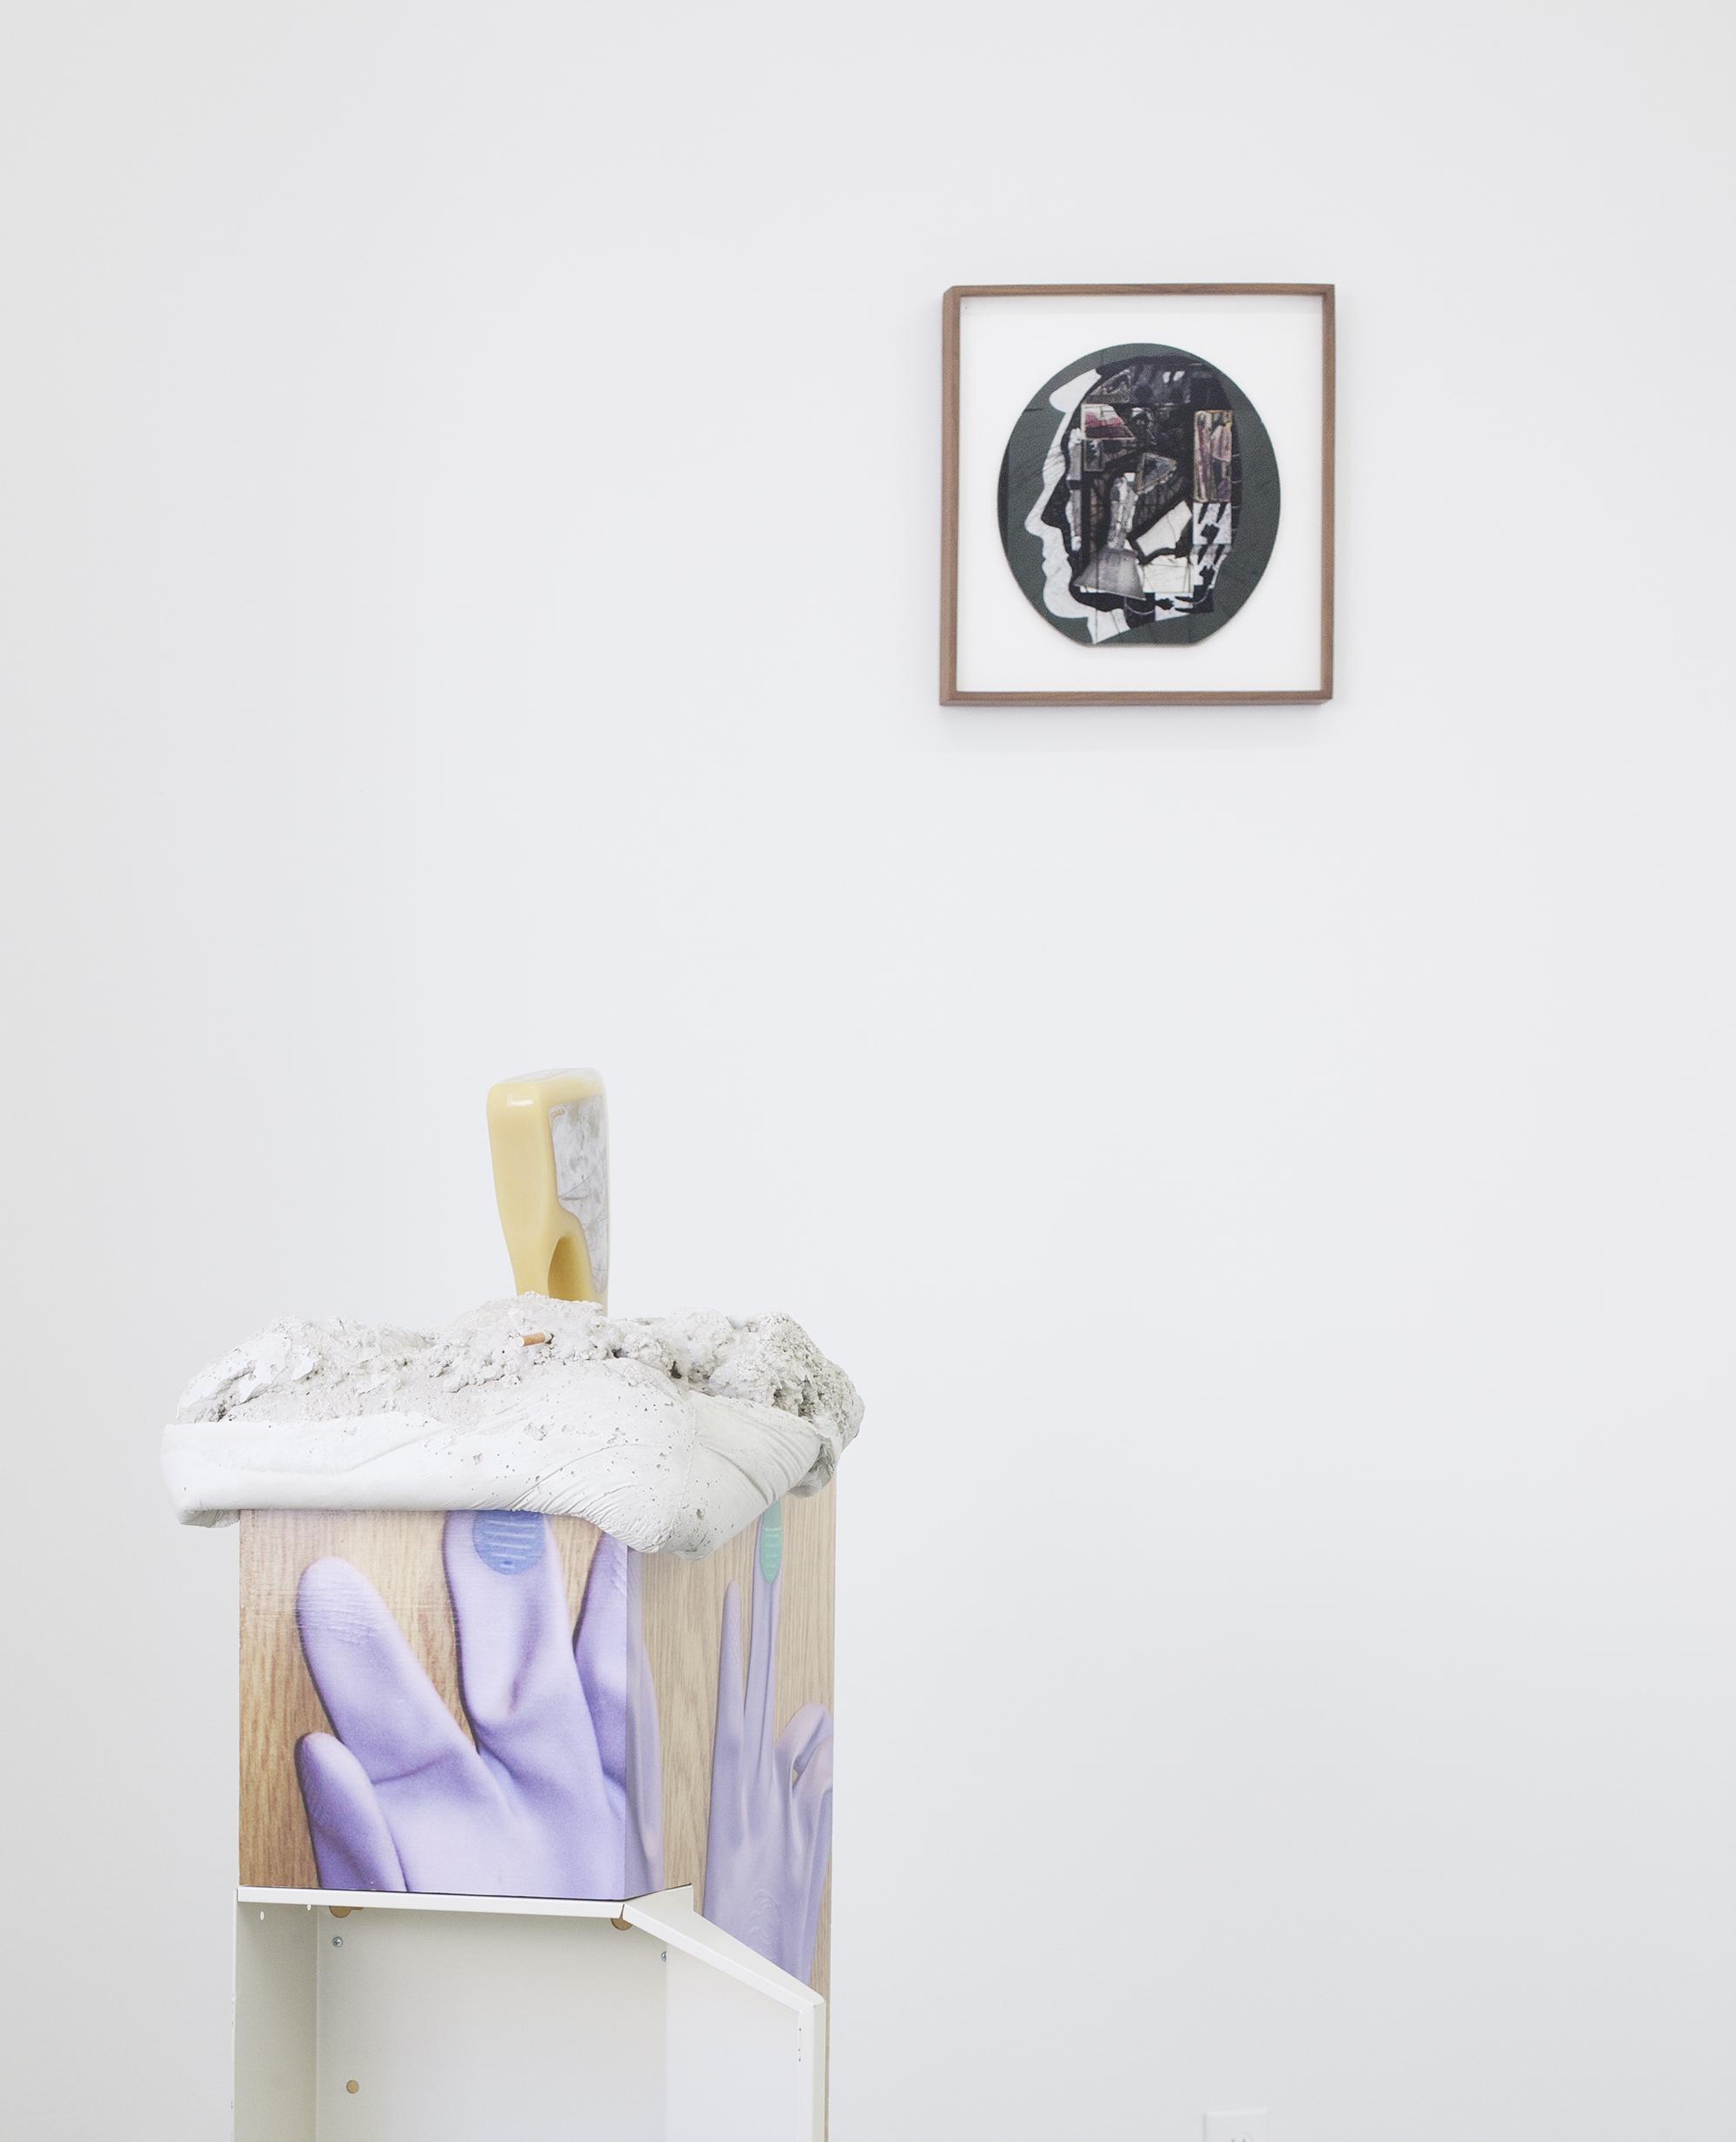 Ray Johnson Untitled (Tab Hunter William Burroughs), 1976-1981 Collage on cardboard panel © Ray Johnson Estate, Courtesy Richard L. Feigen & Co.